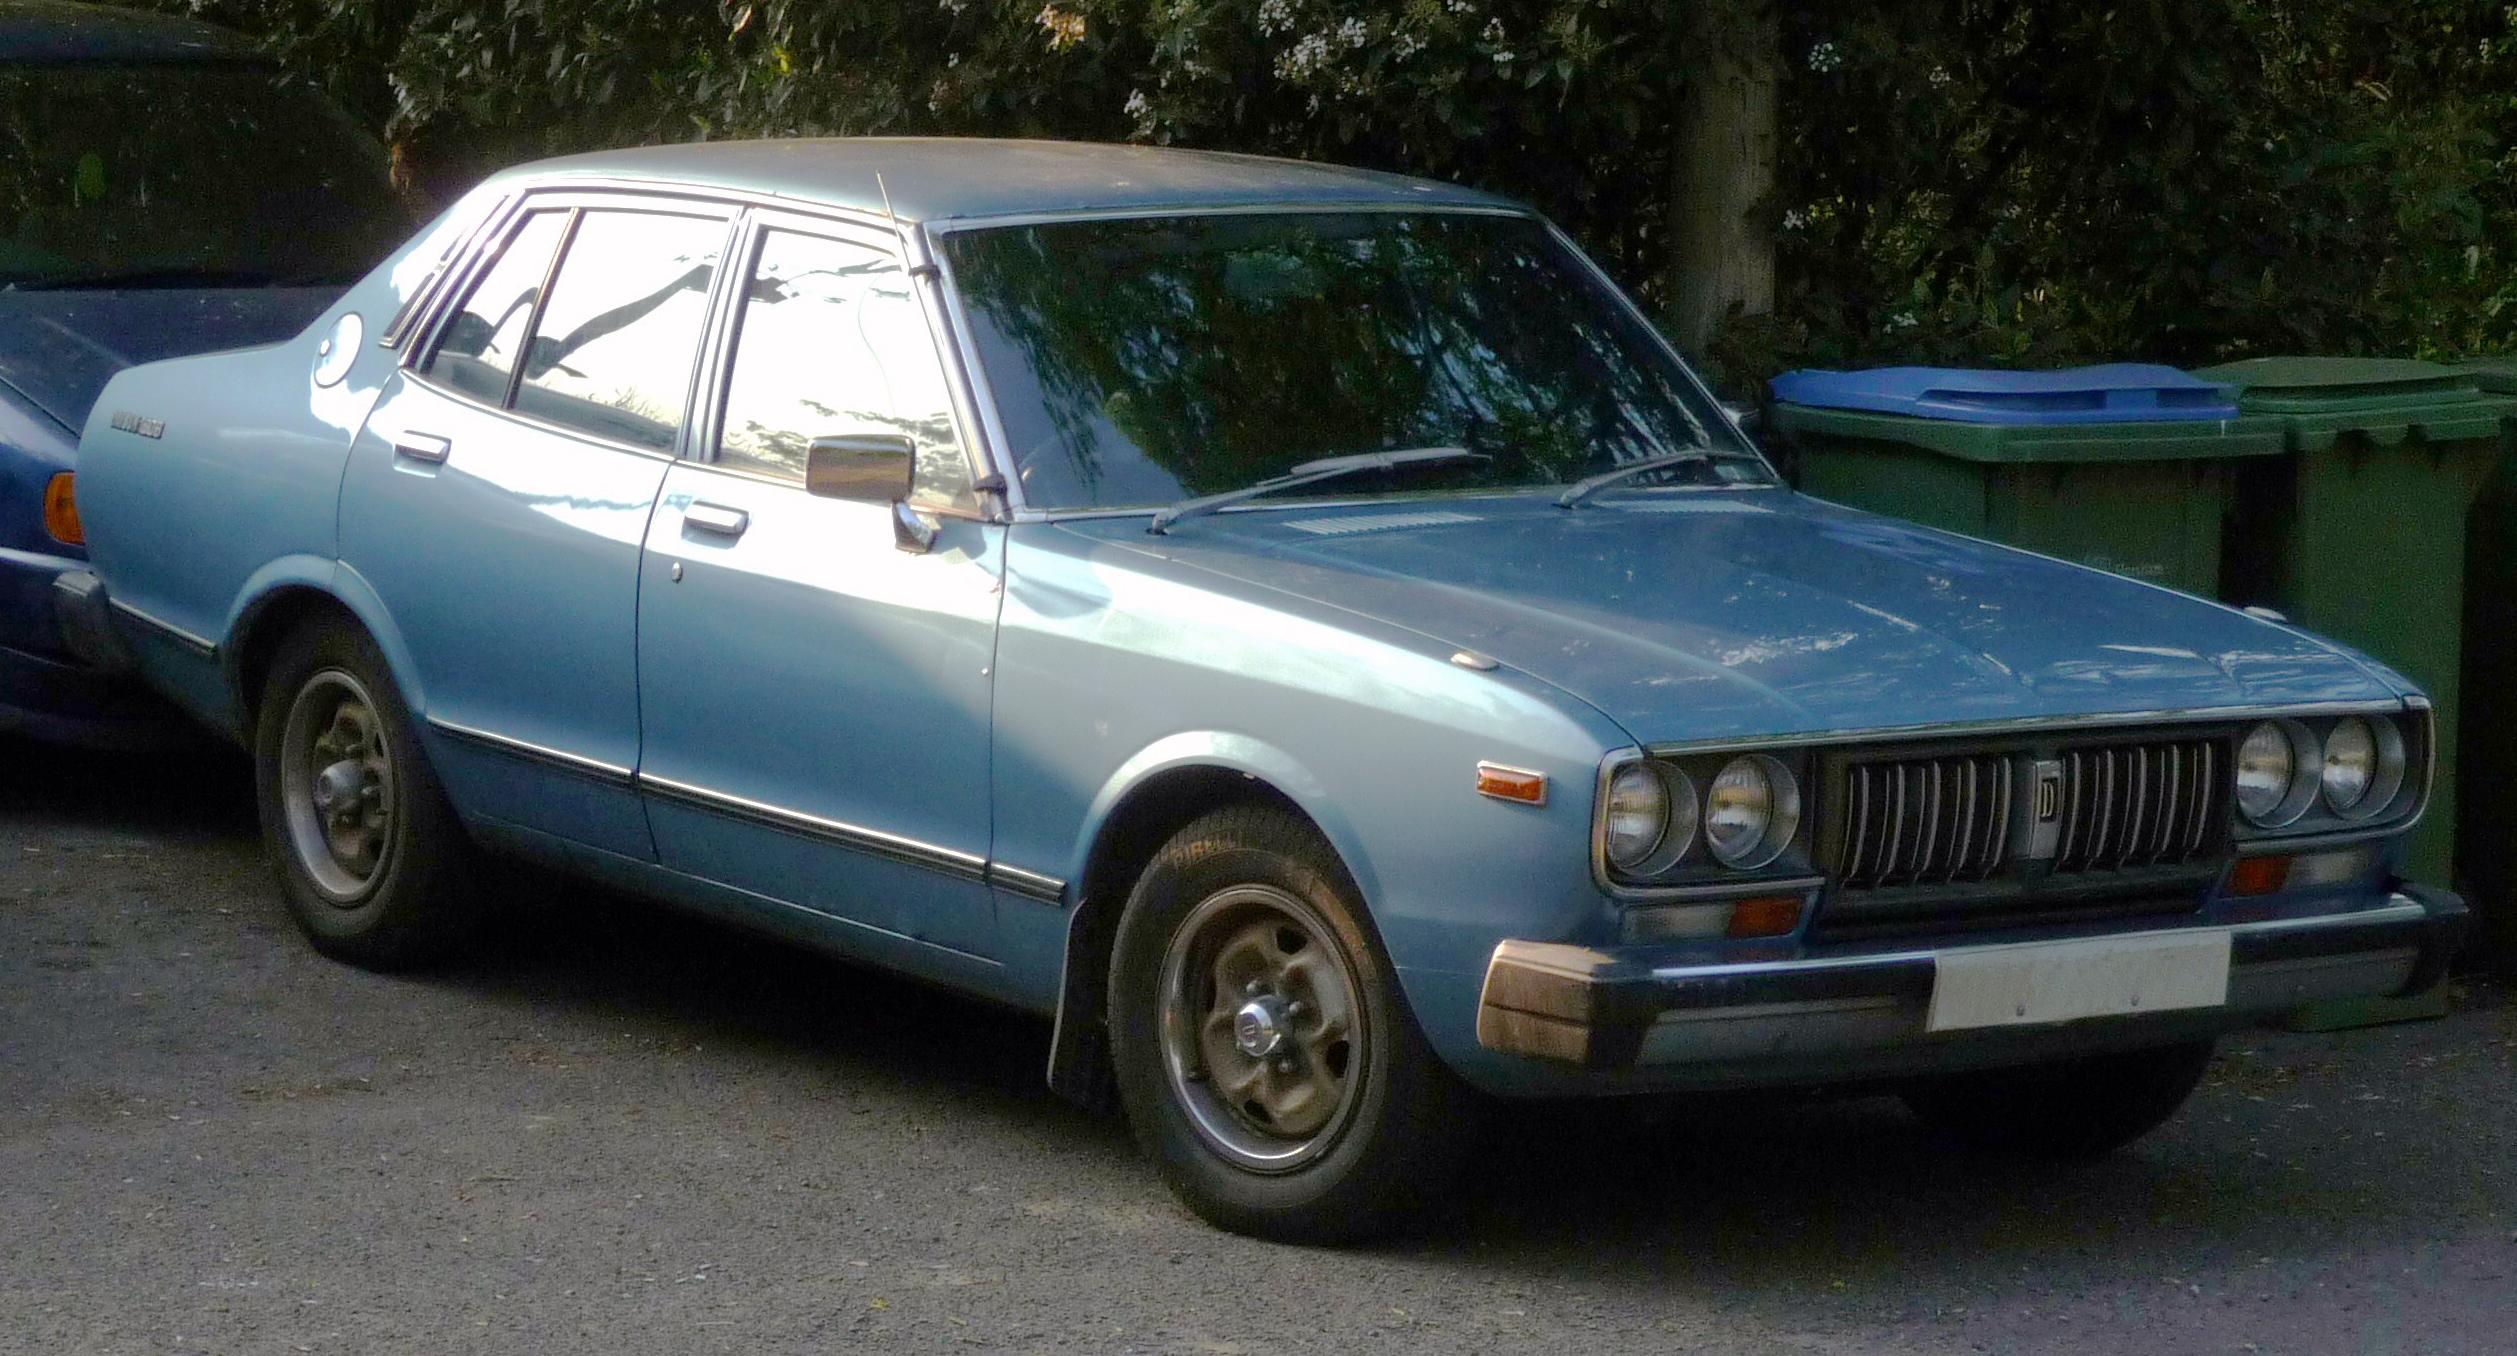 file 1979 datsun 180b bluebird wikimedia mons